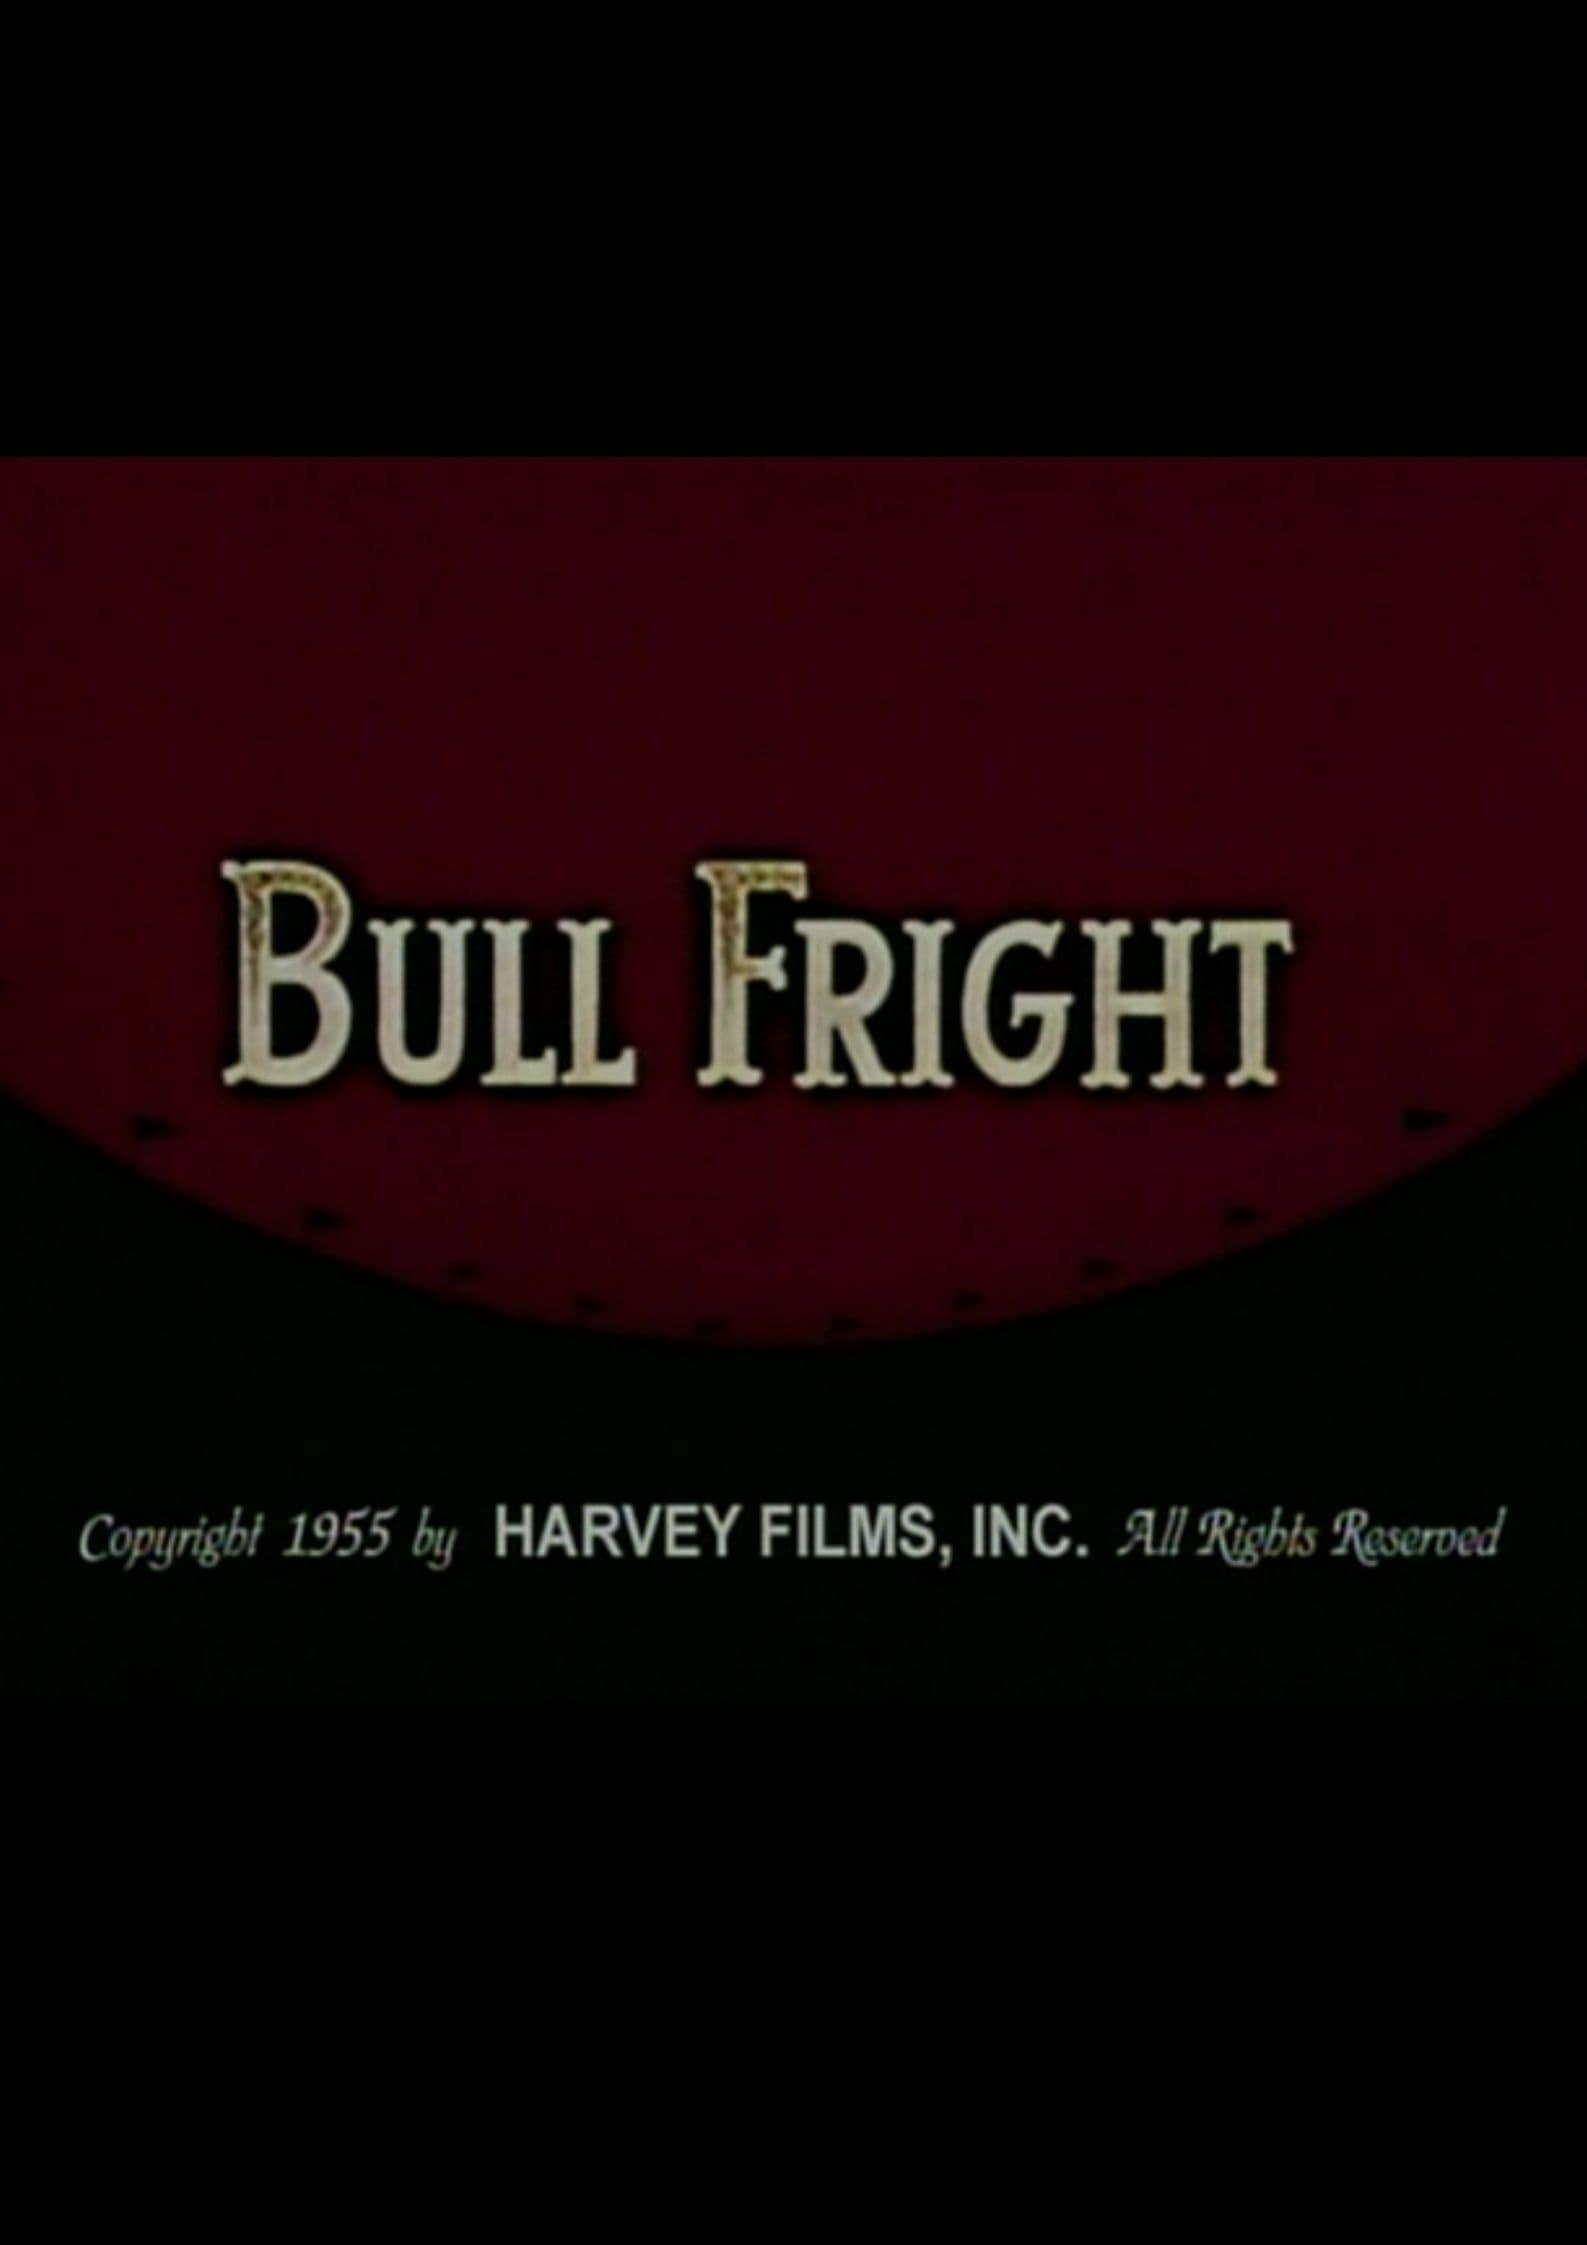 Bull Fright